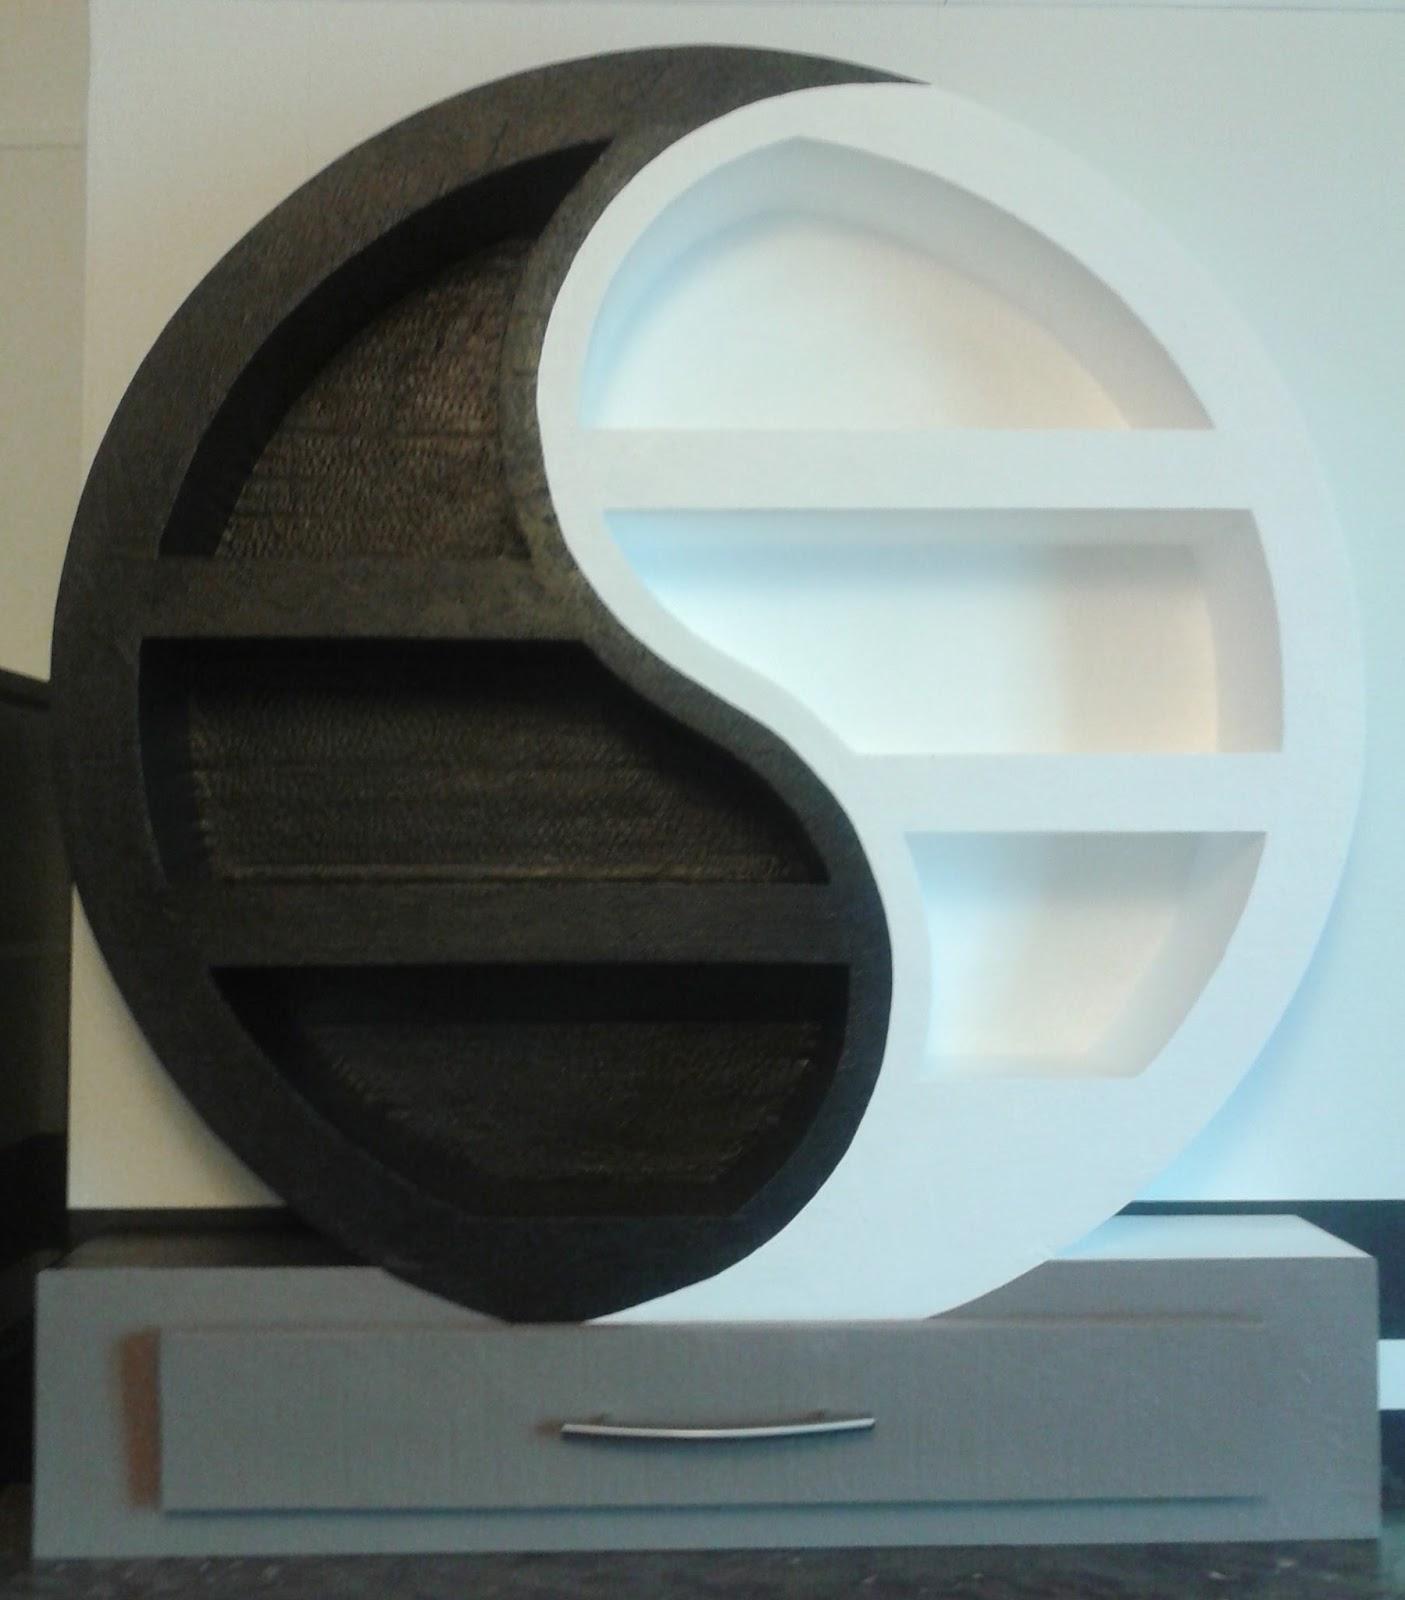 Sabine cr a carton chambre garcon for Meuble ying yang